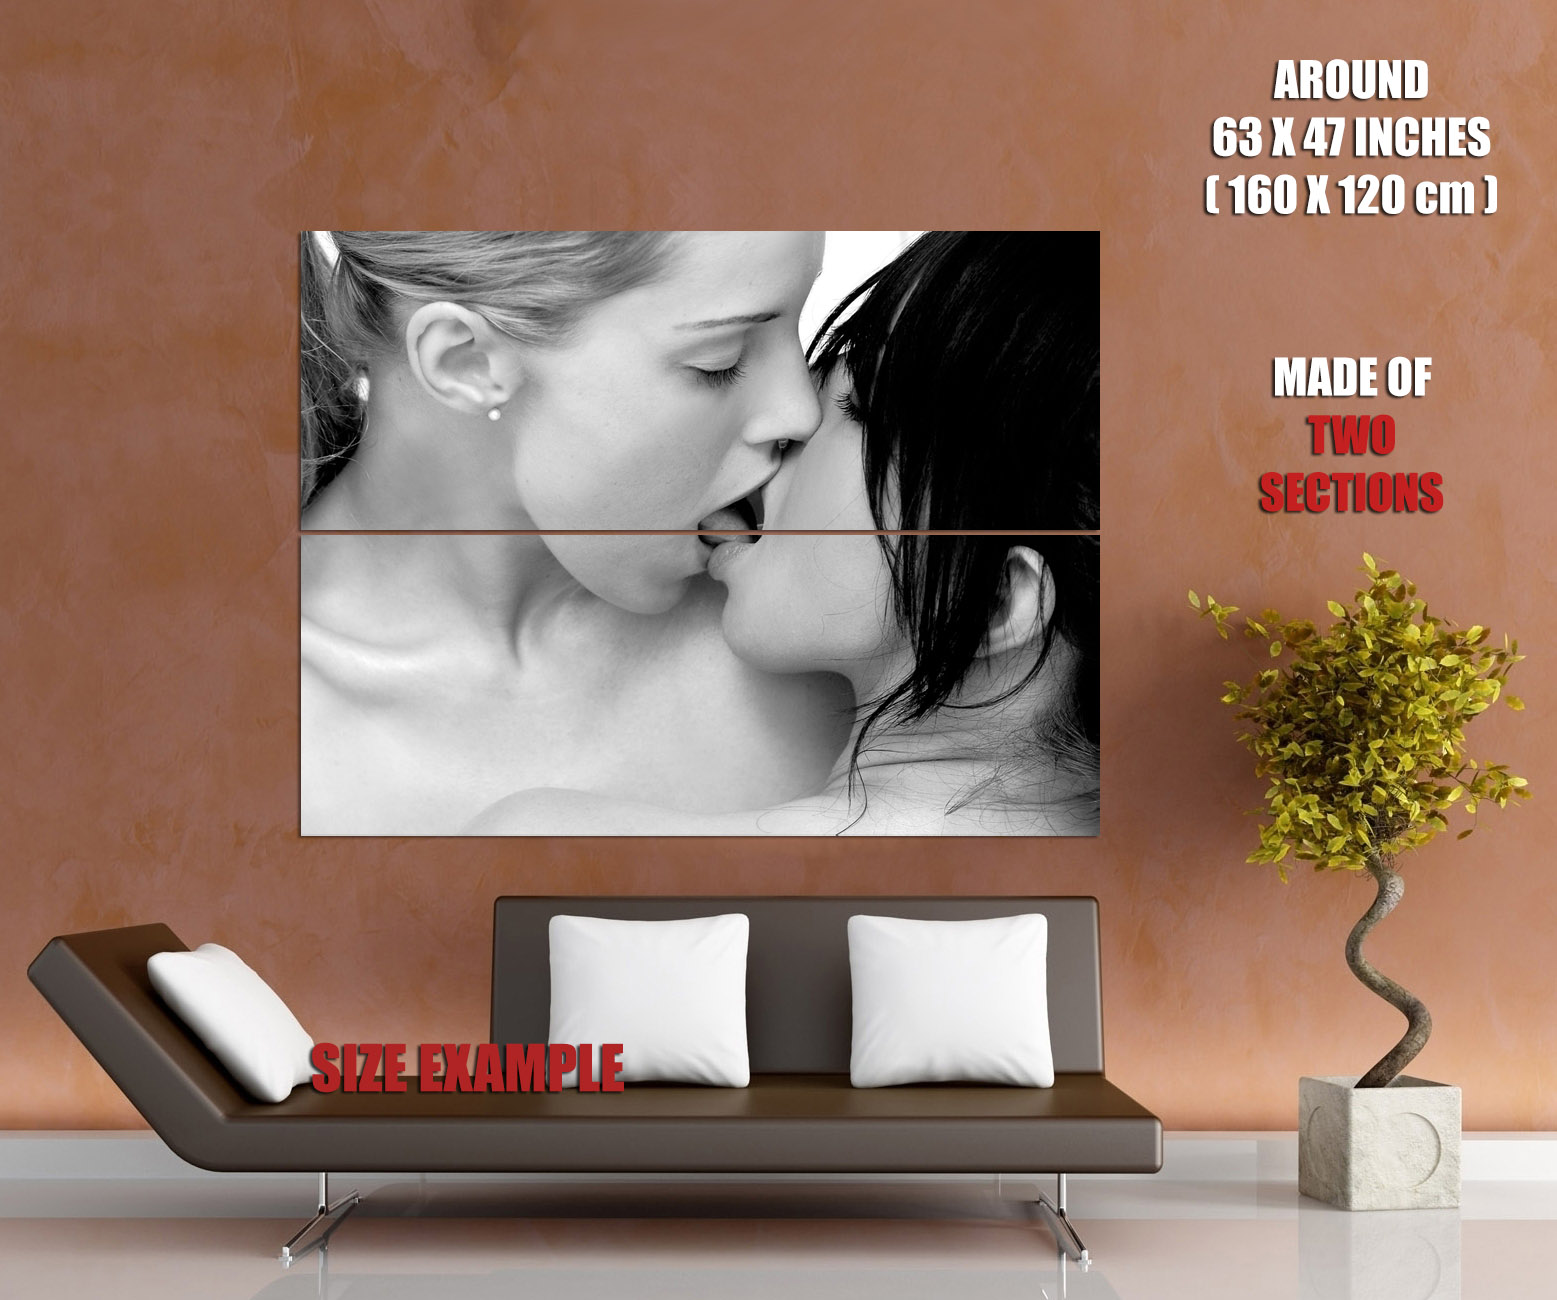 D3743 Hot Kissing Girls Tongue BW Lesbian Gigantic Print POSTER